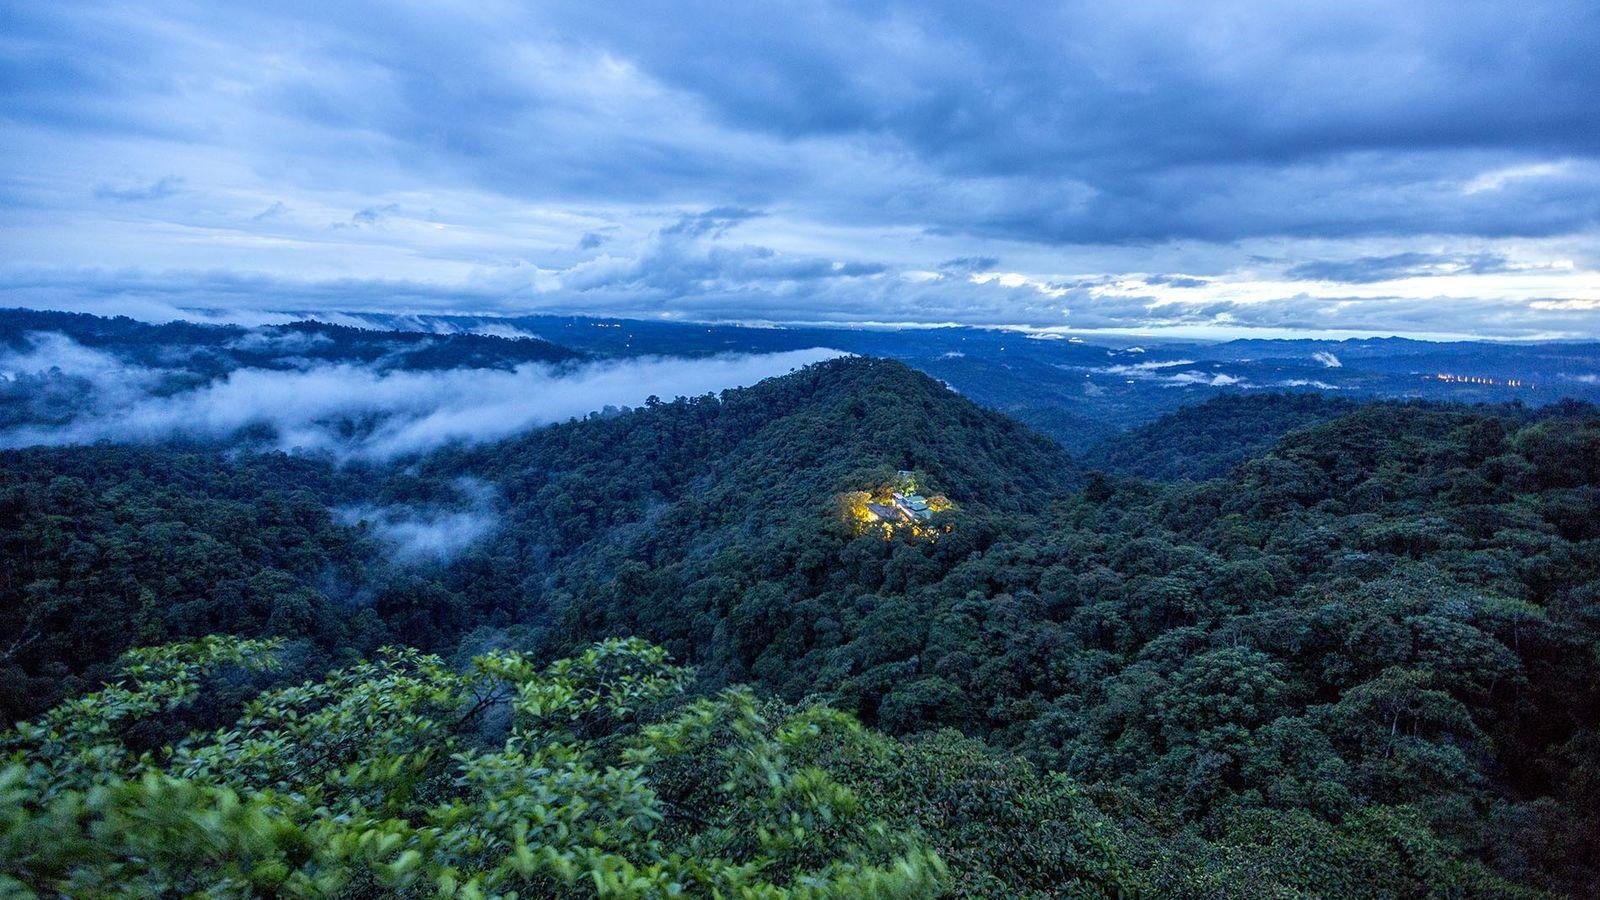 Mashpi Lodge & Choco Cloud Forest